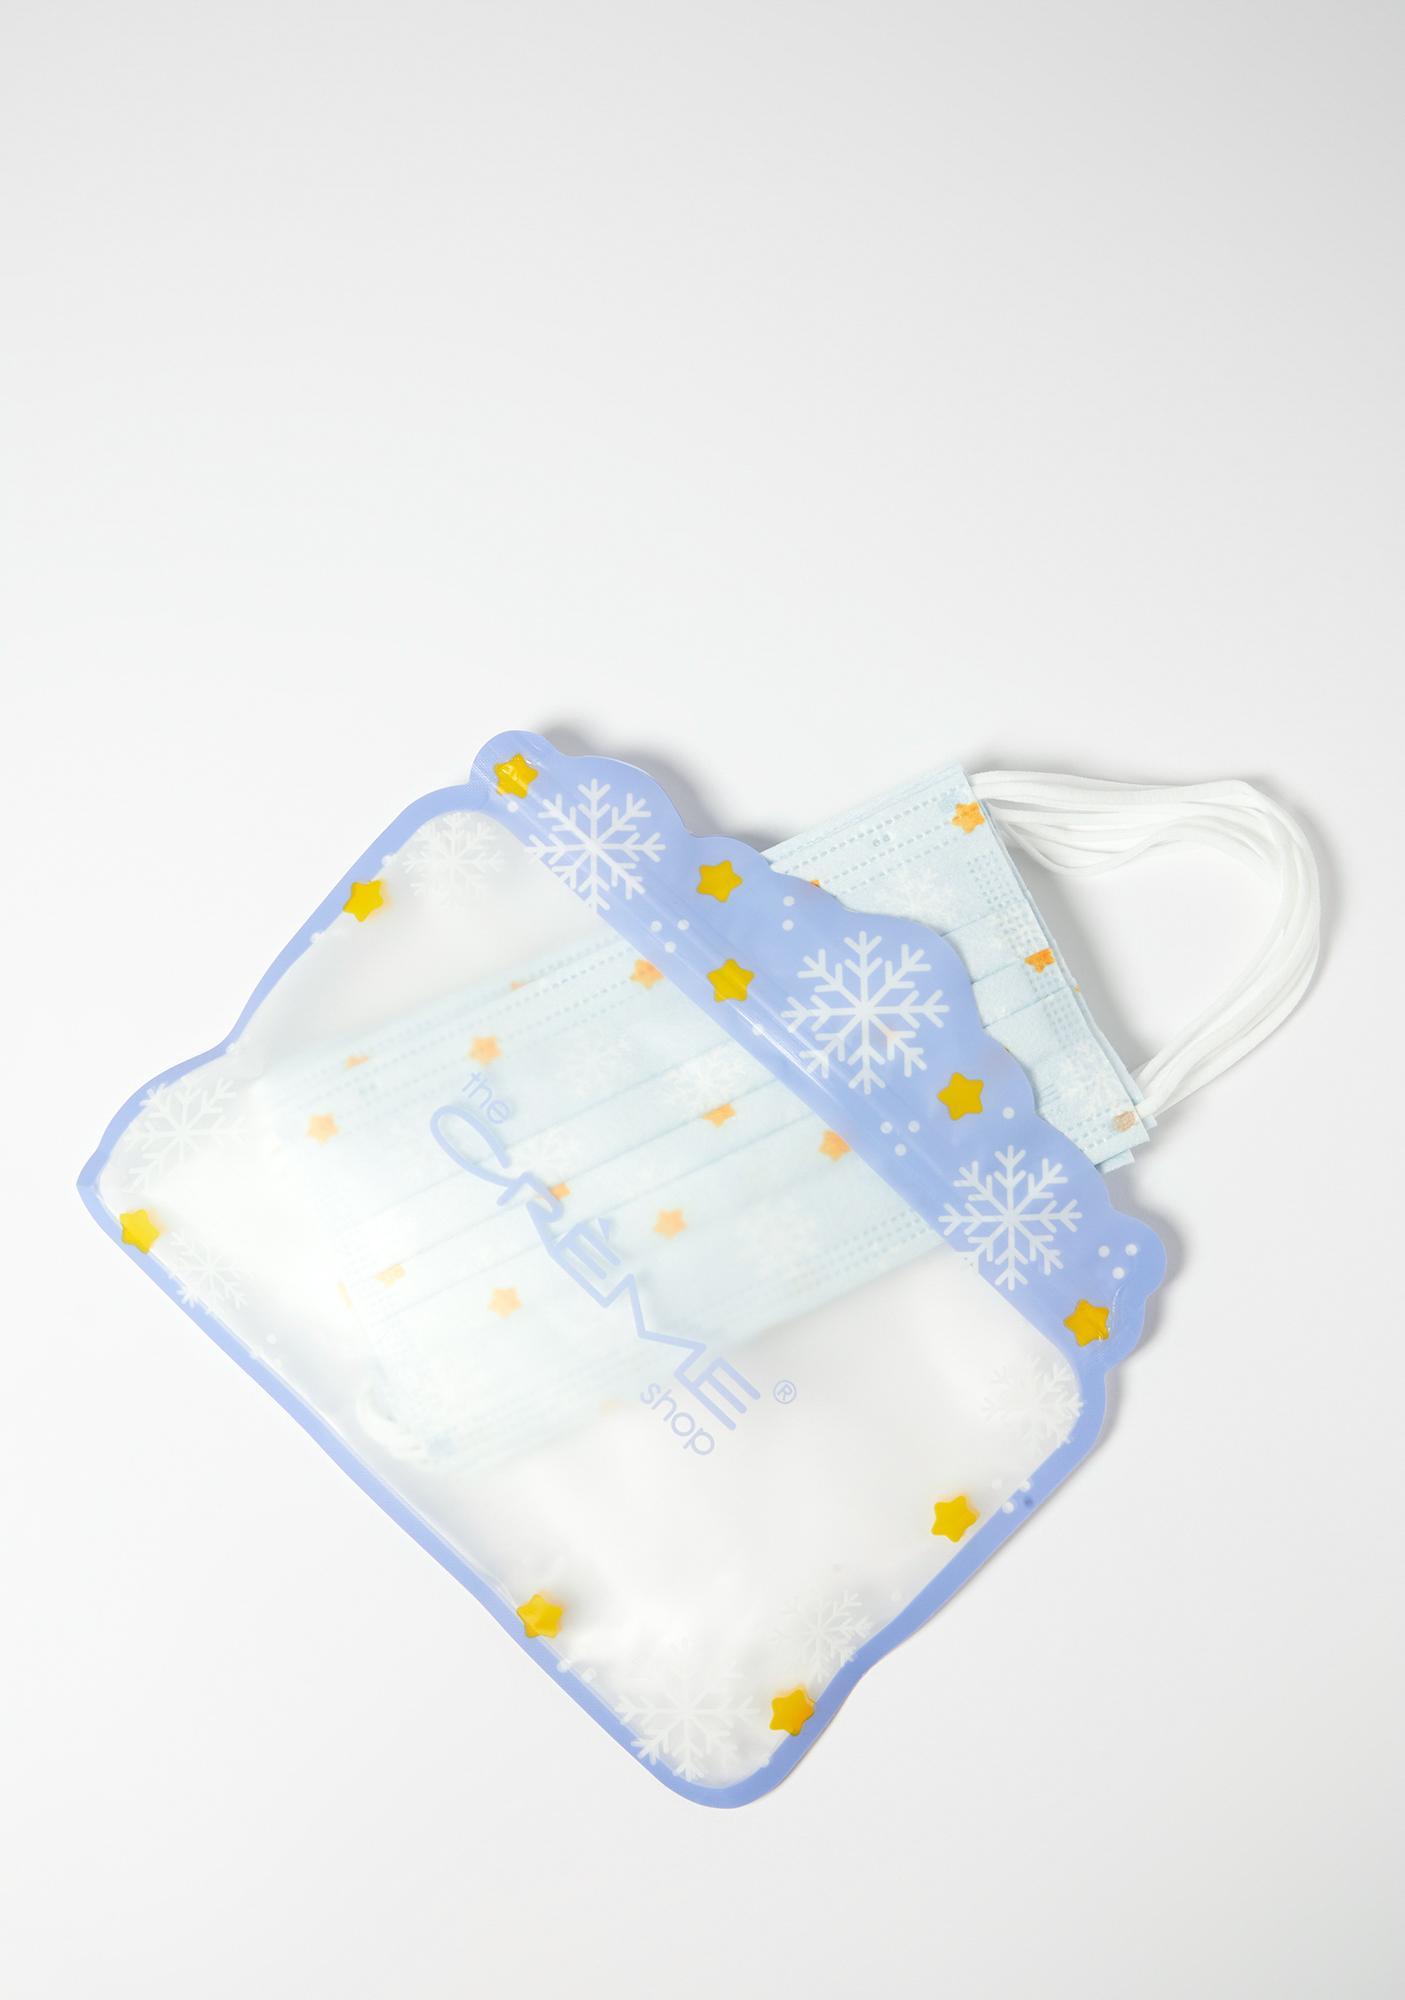 The Crème Shop Snowfall Holiday Face Mask Set